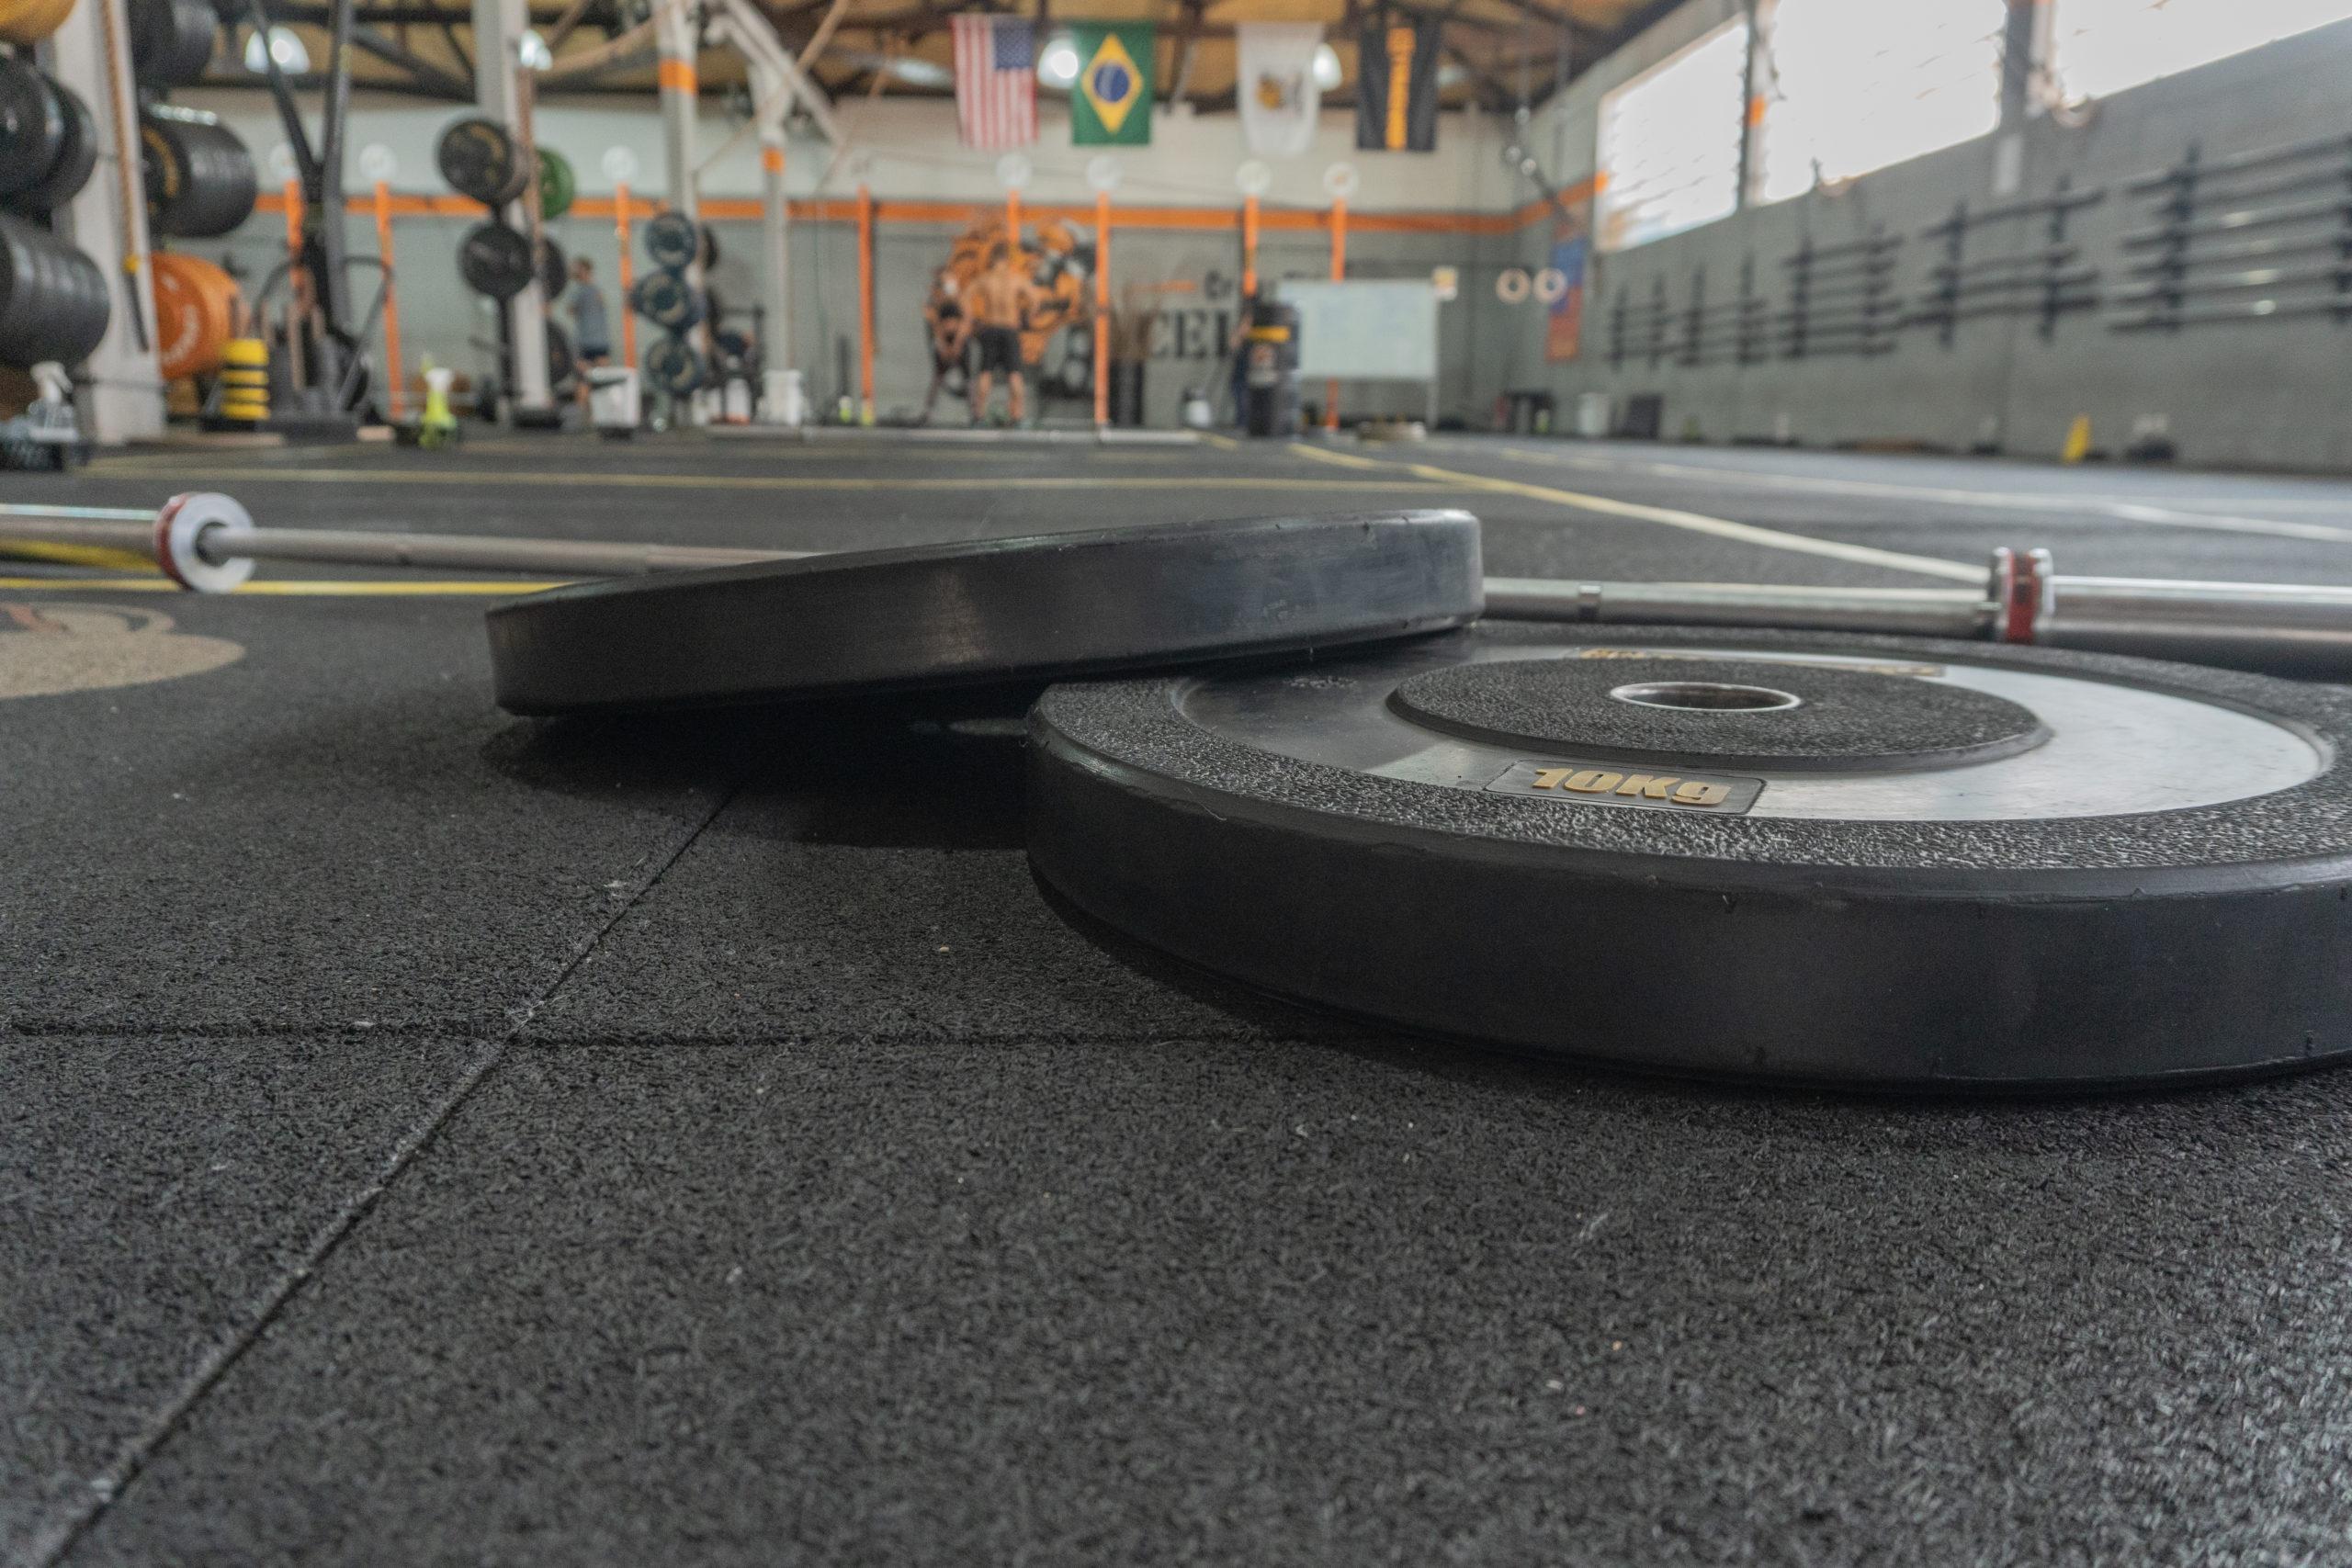 Piso para CrossFit: borracha antiderrapante para piso